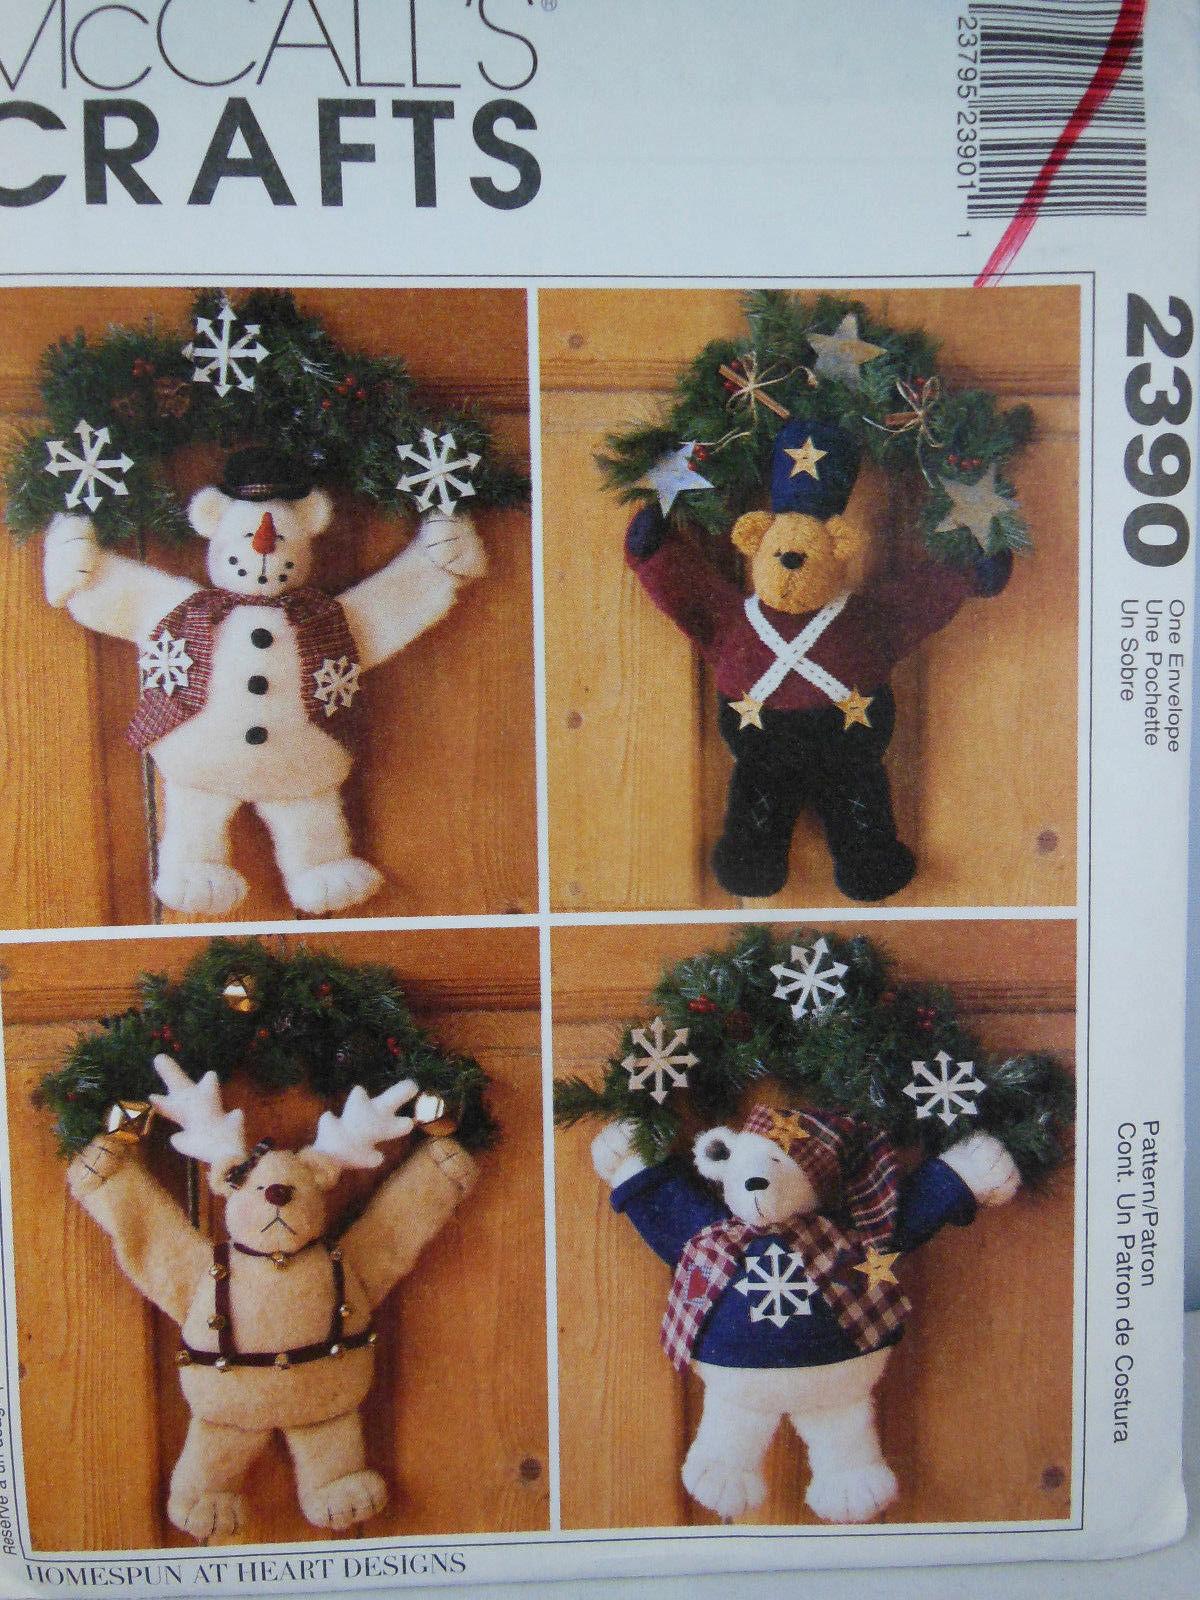 "McCall's 2390 Crafts Pattern Warm Fuzzy Winter 14"" Bear Wreaths UNCUT Smoke free - $4.15"